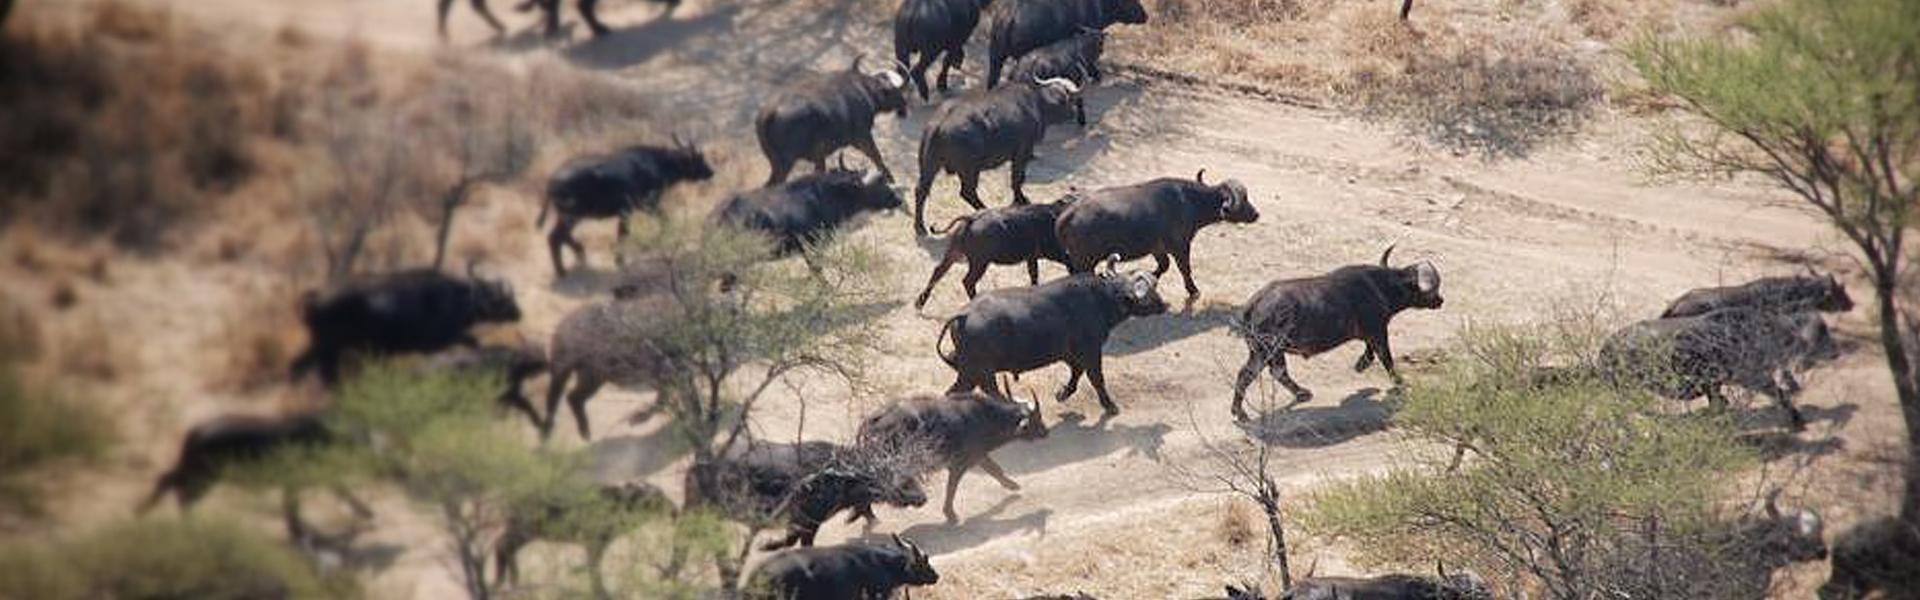 BuffaloStampede